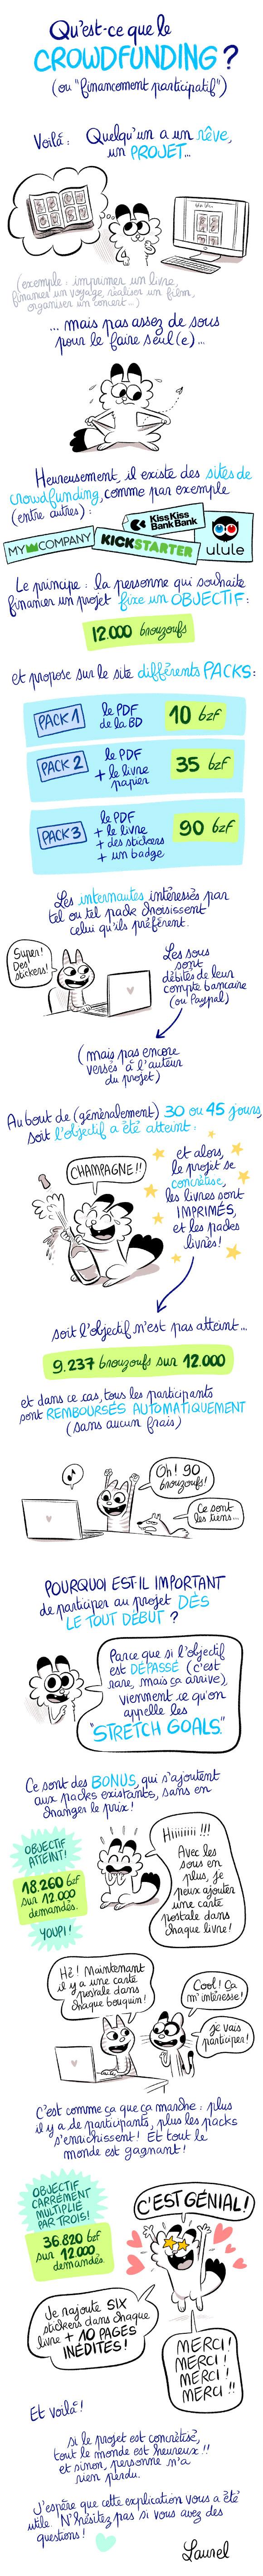 blog-financement-participatif-explication-BD.jpg